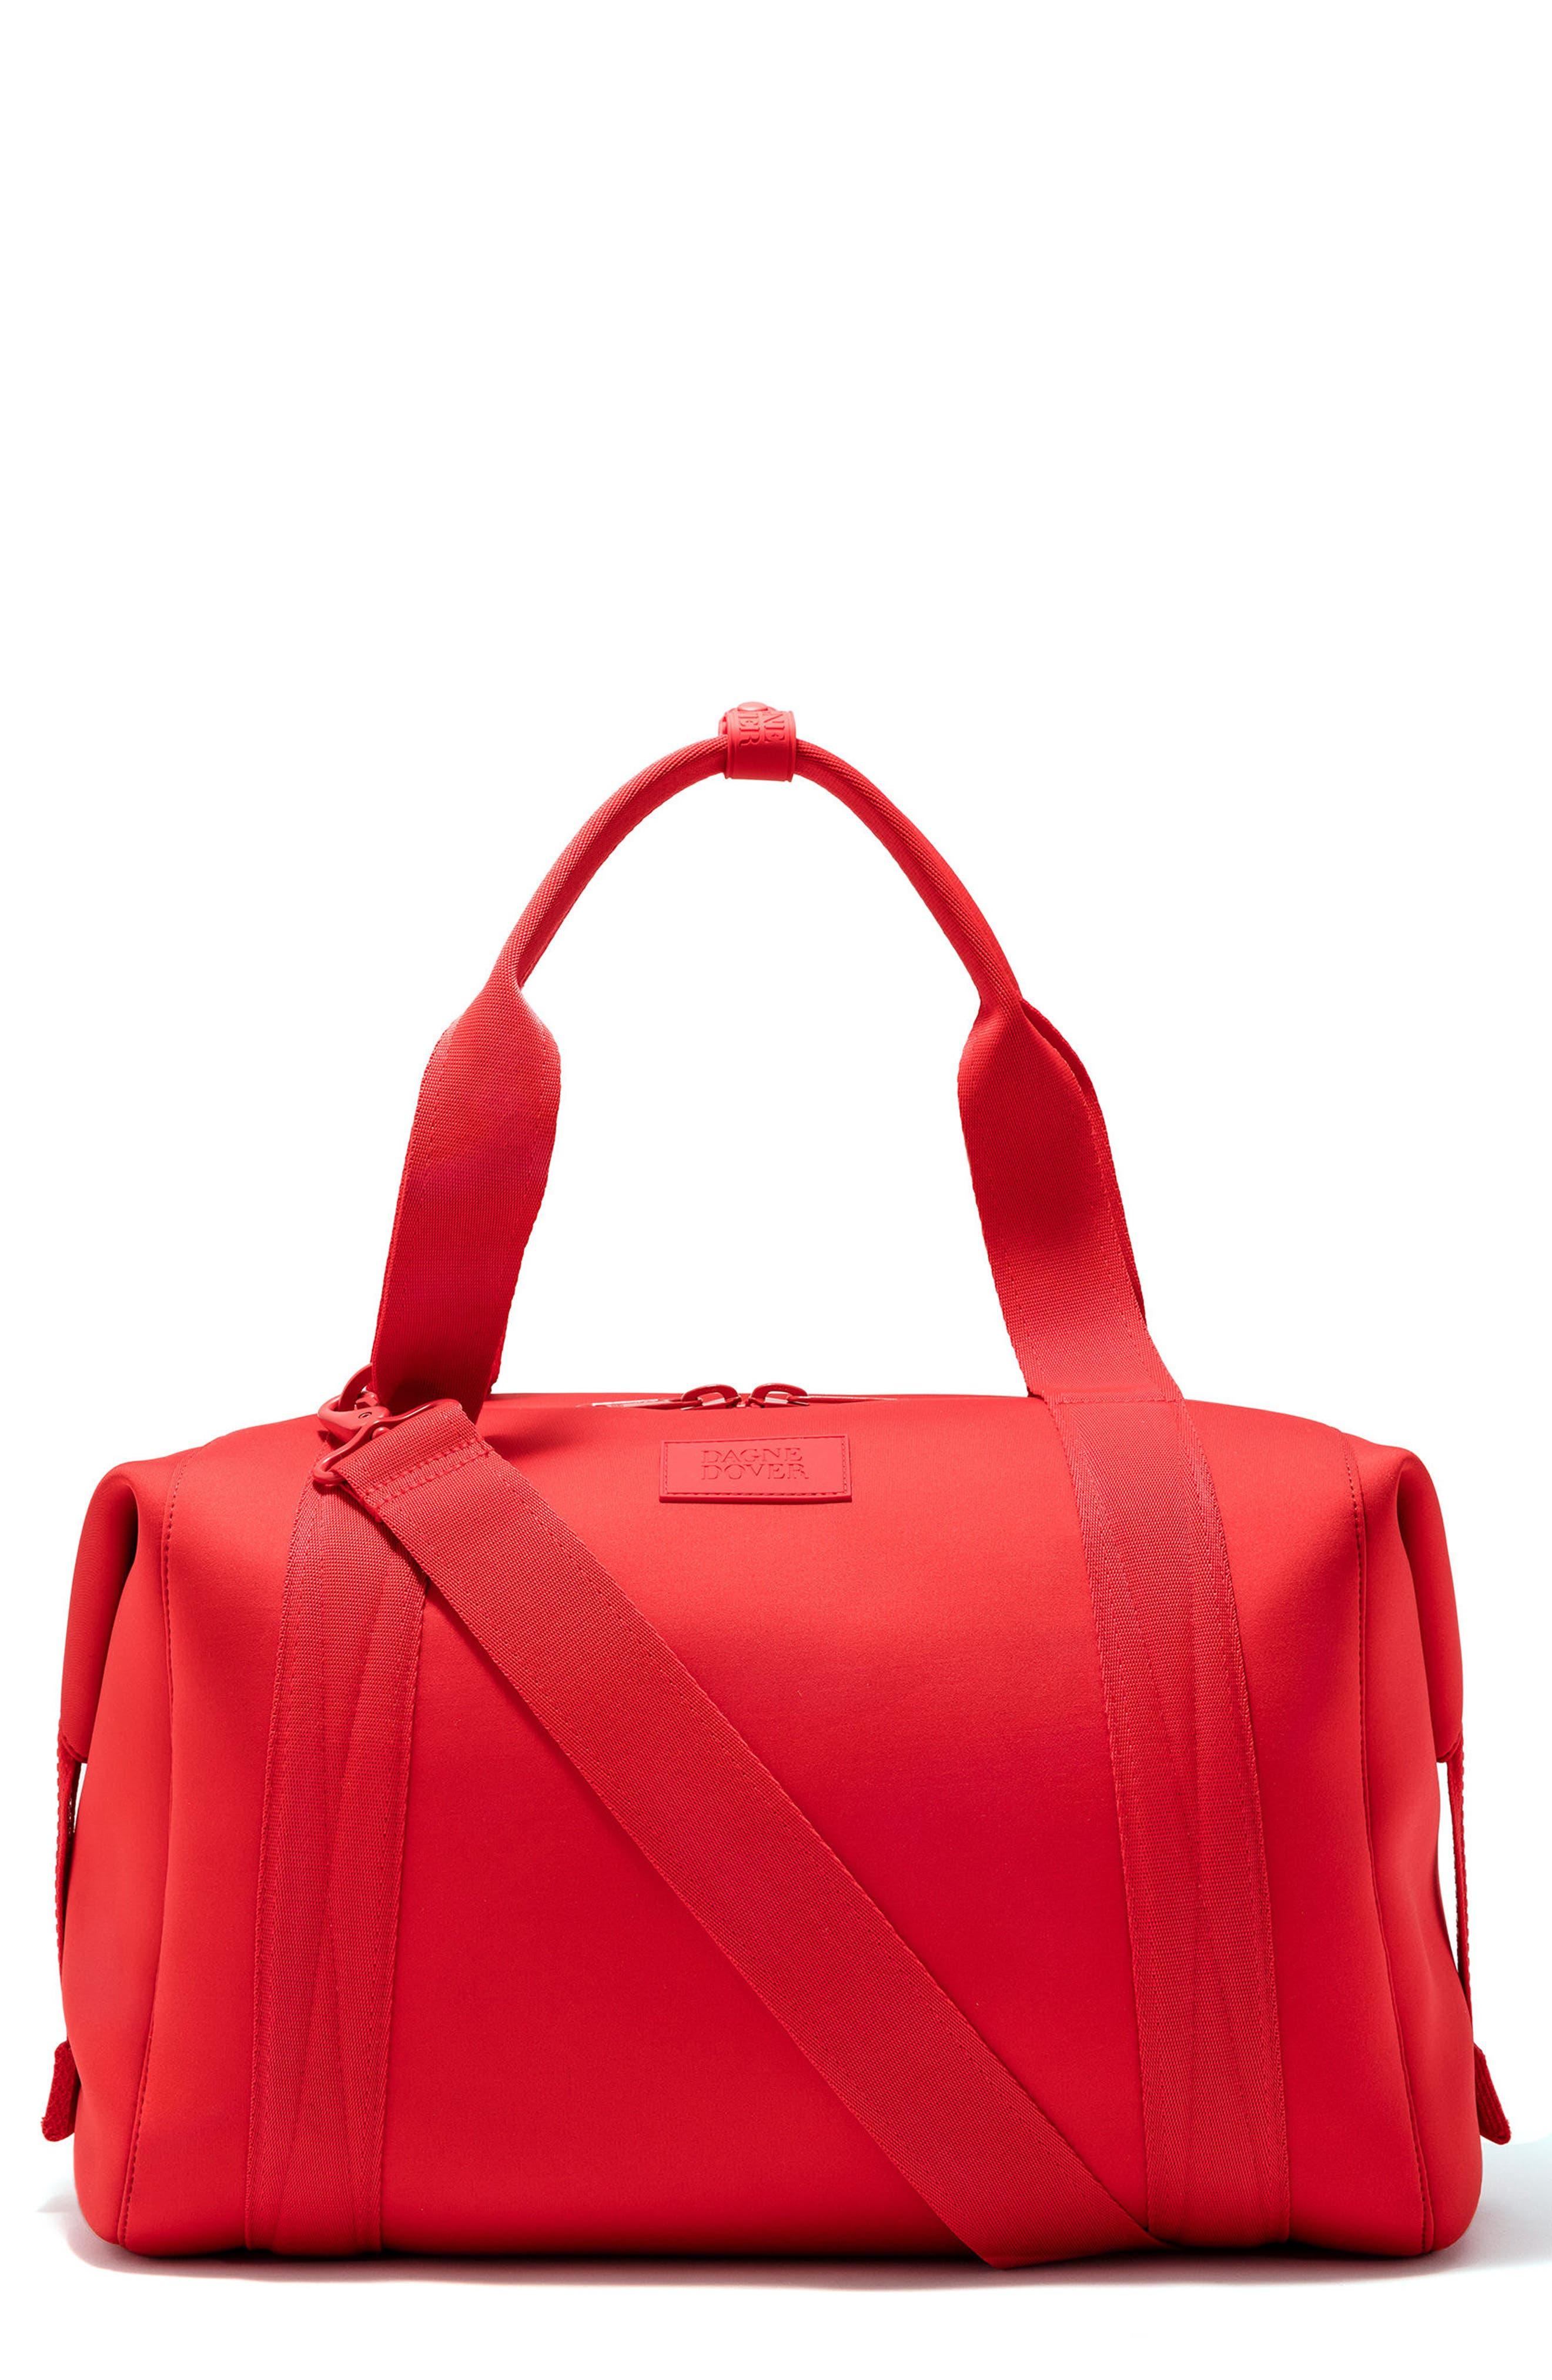 365 Large Landon Neoprene Carryall Duffel Bag,                             Main thumbnail 7, color,